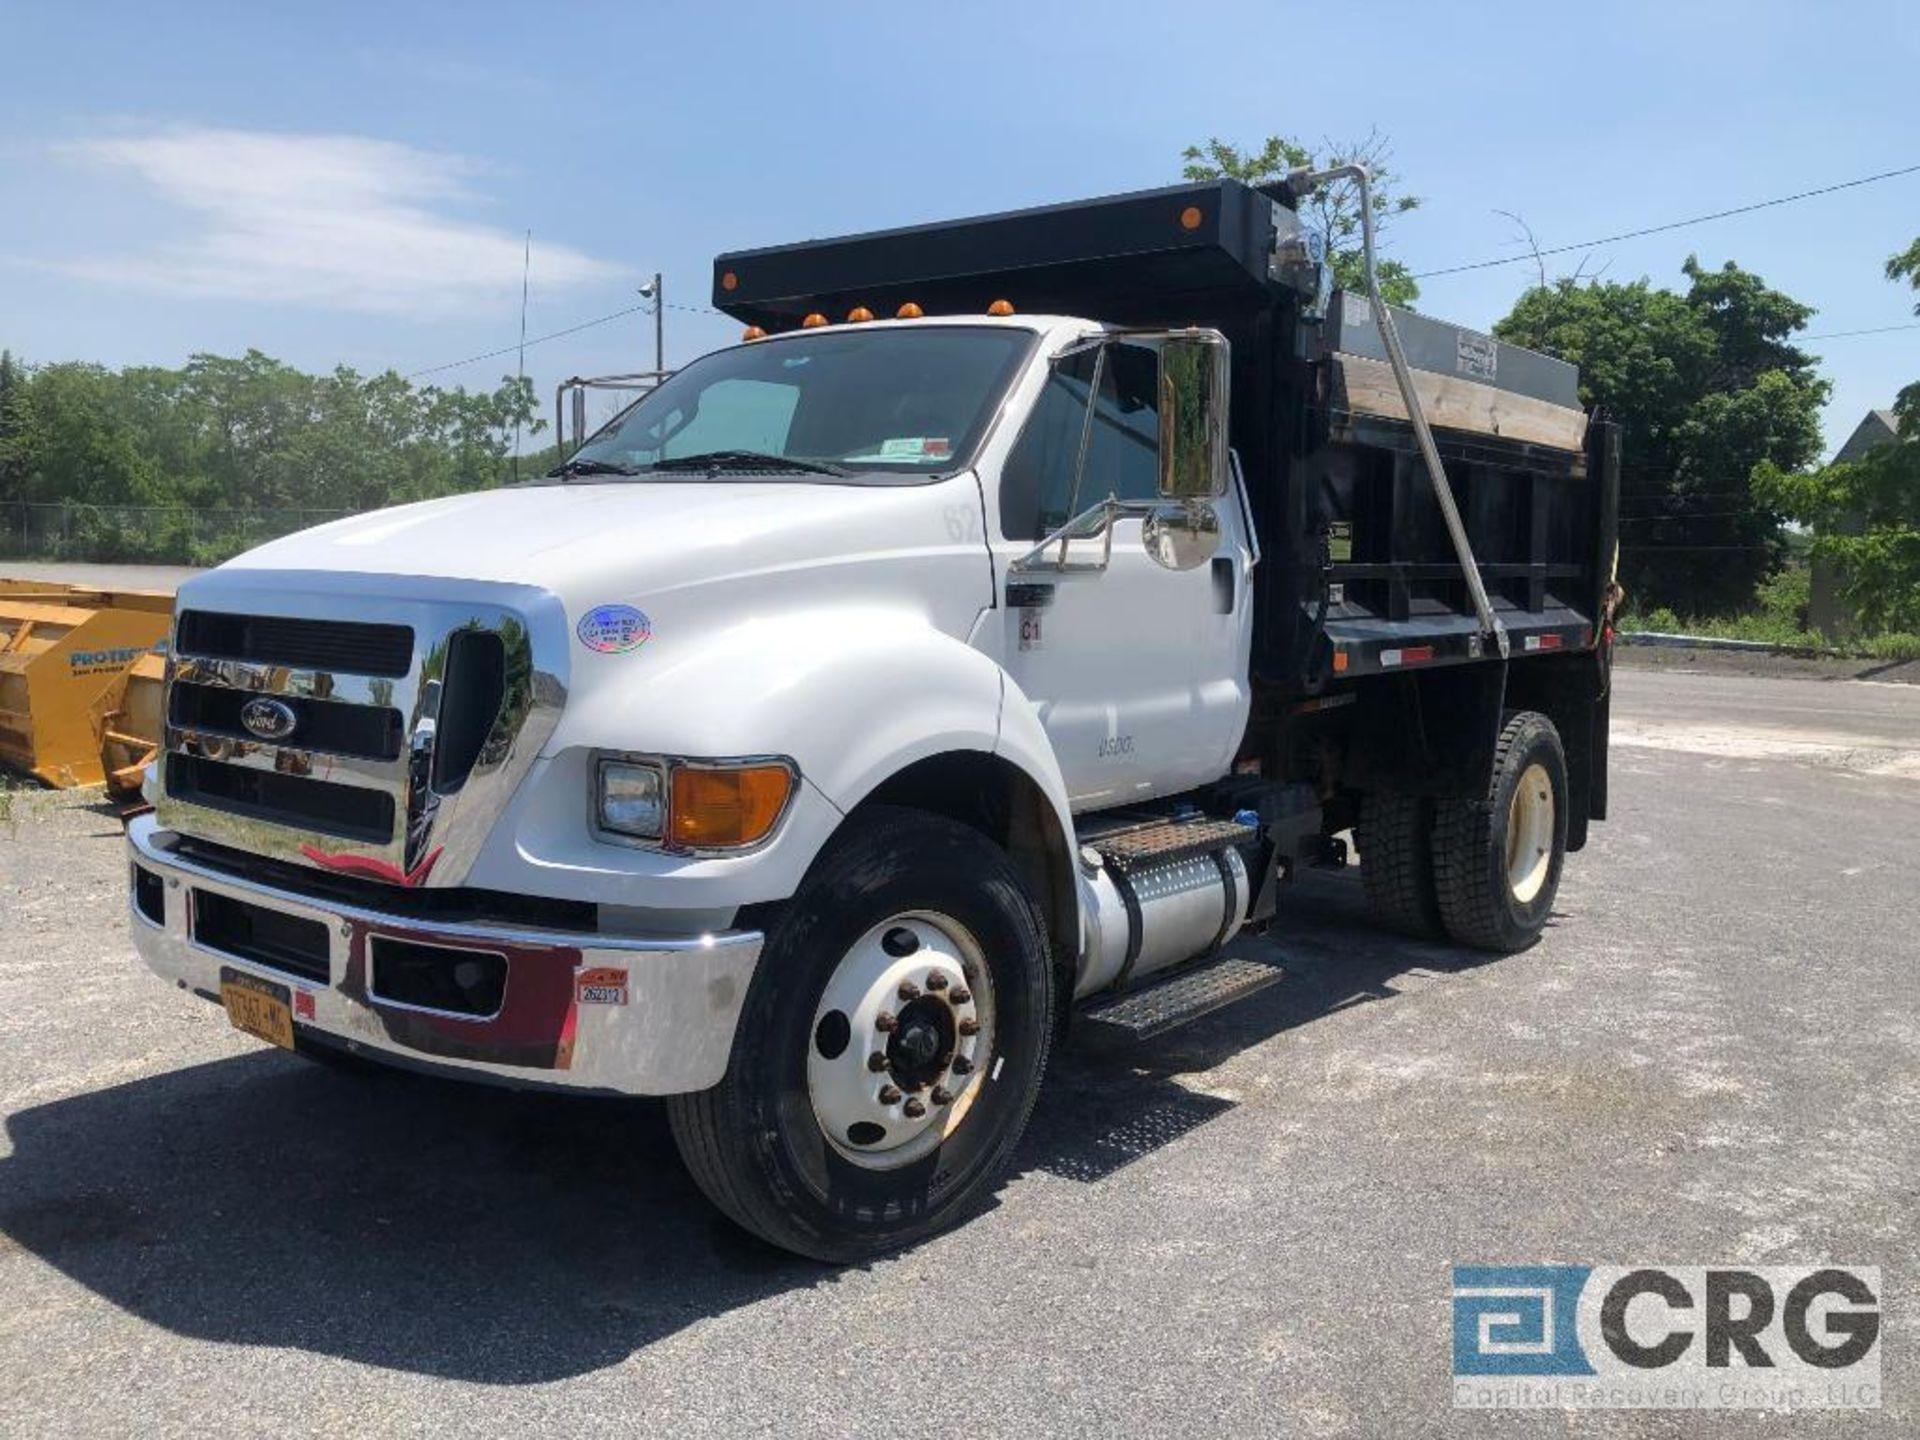 Lot 325 - 2013 Ford F750 SD Dump Truck, 6 Wheel, Steel Dump body, Automatic Transmission, 6000 Miles, vin: